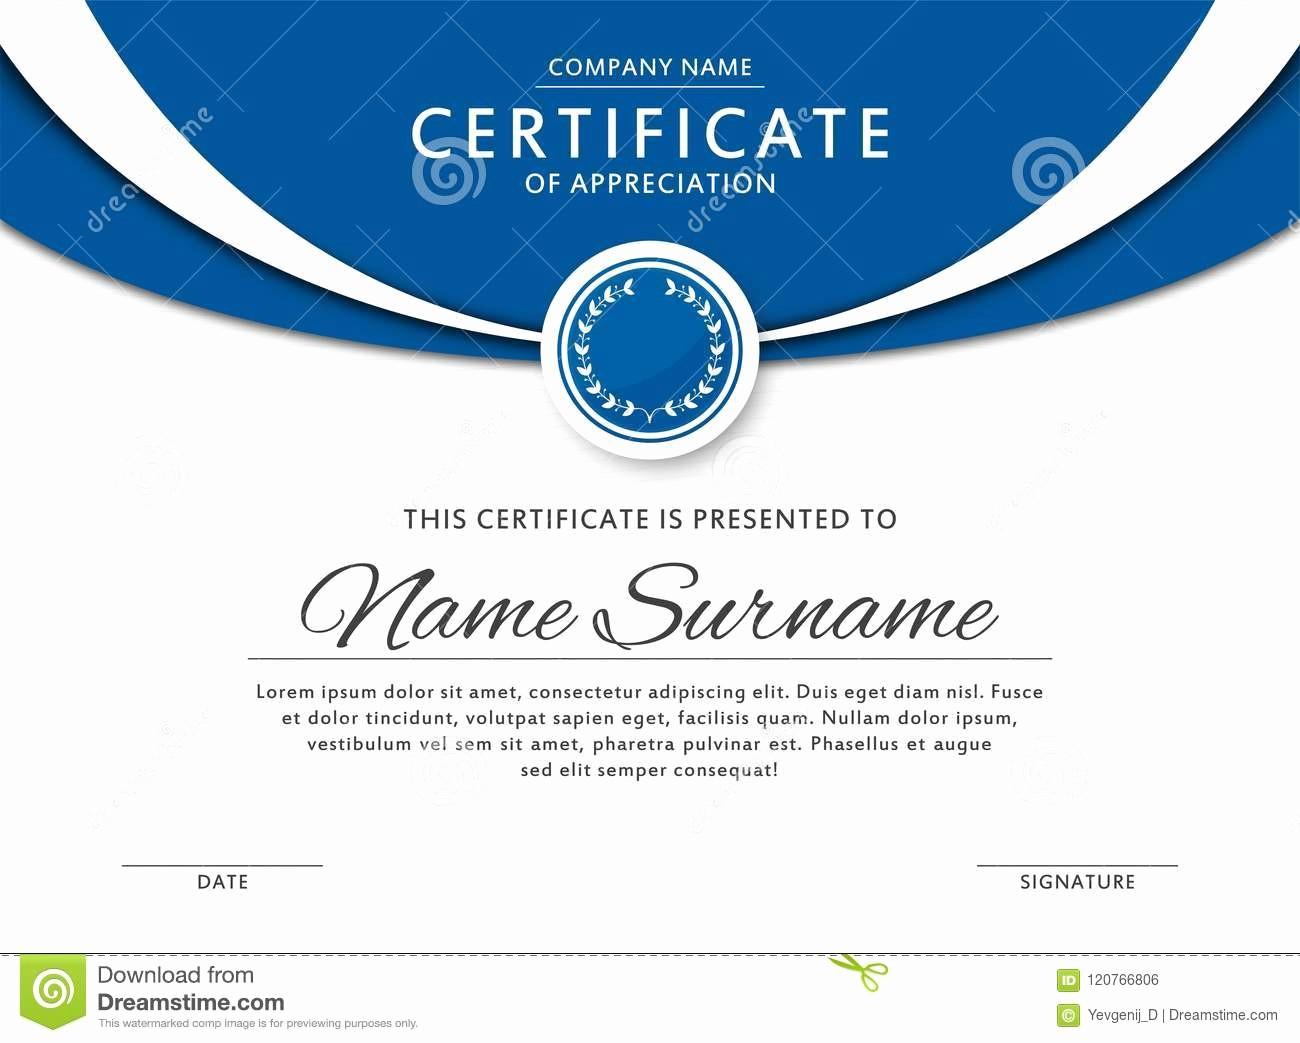 Border for Certificate Of Appreciation New Azul Diploma Frame Border Blue